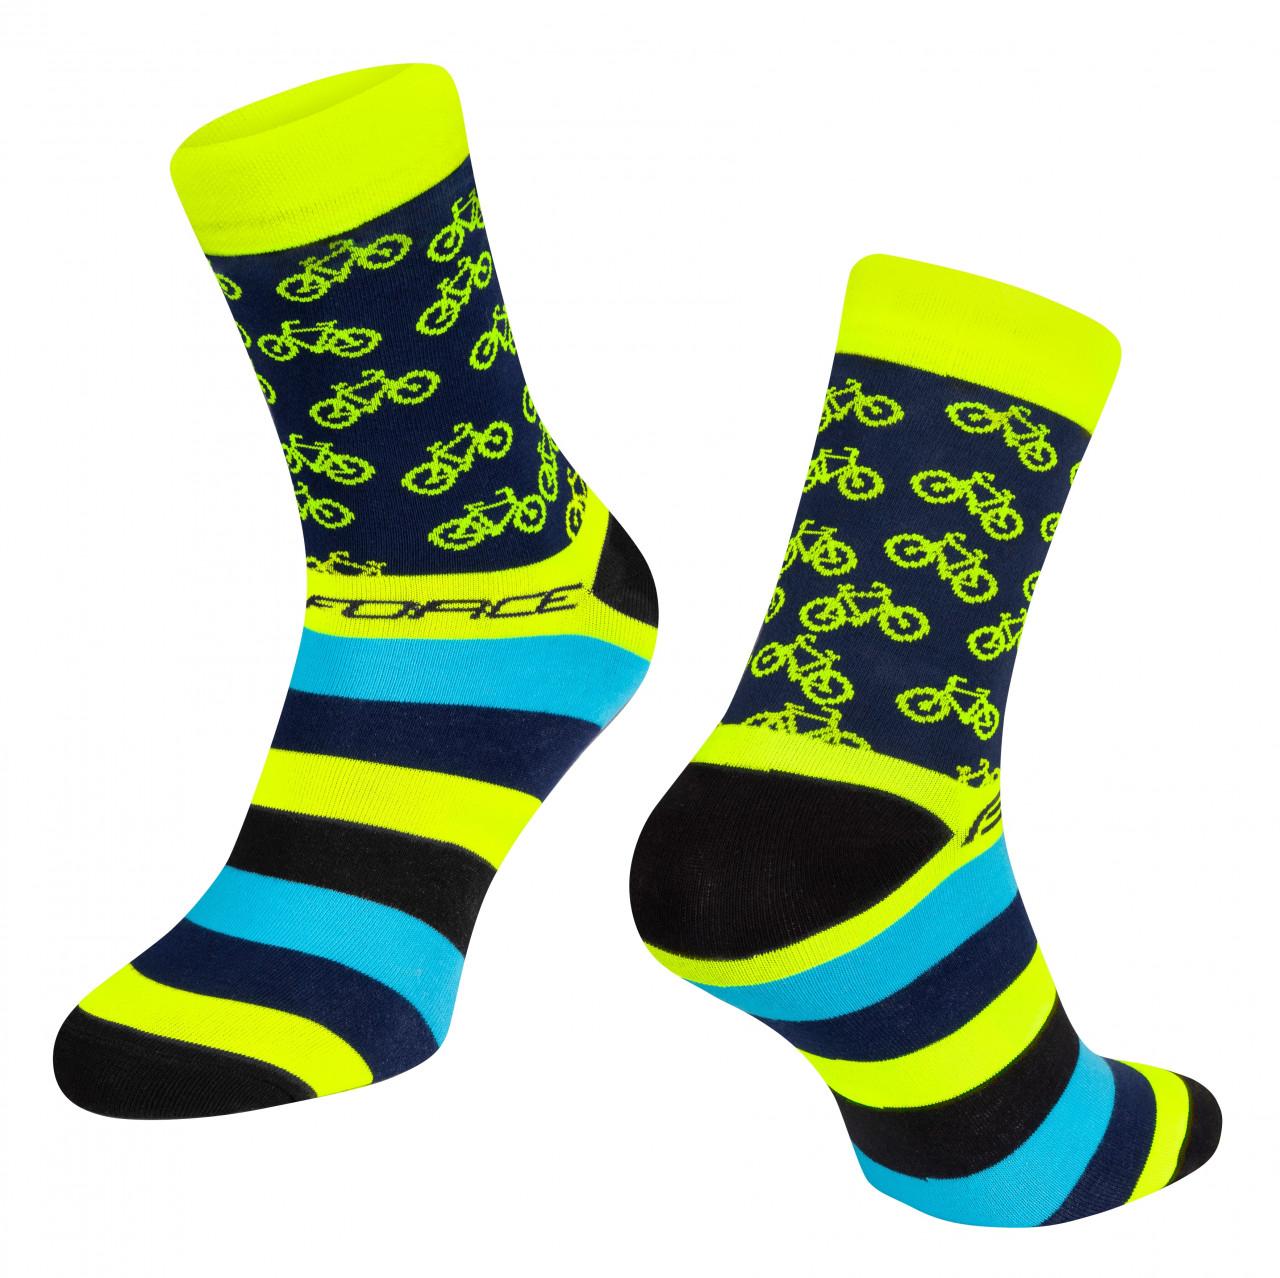 FORCE ponožky CYCLE, žlté S-M/36-41